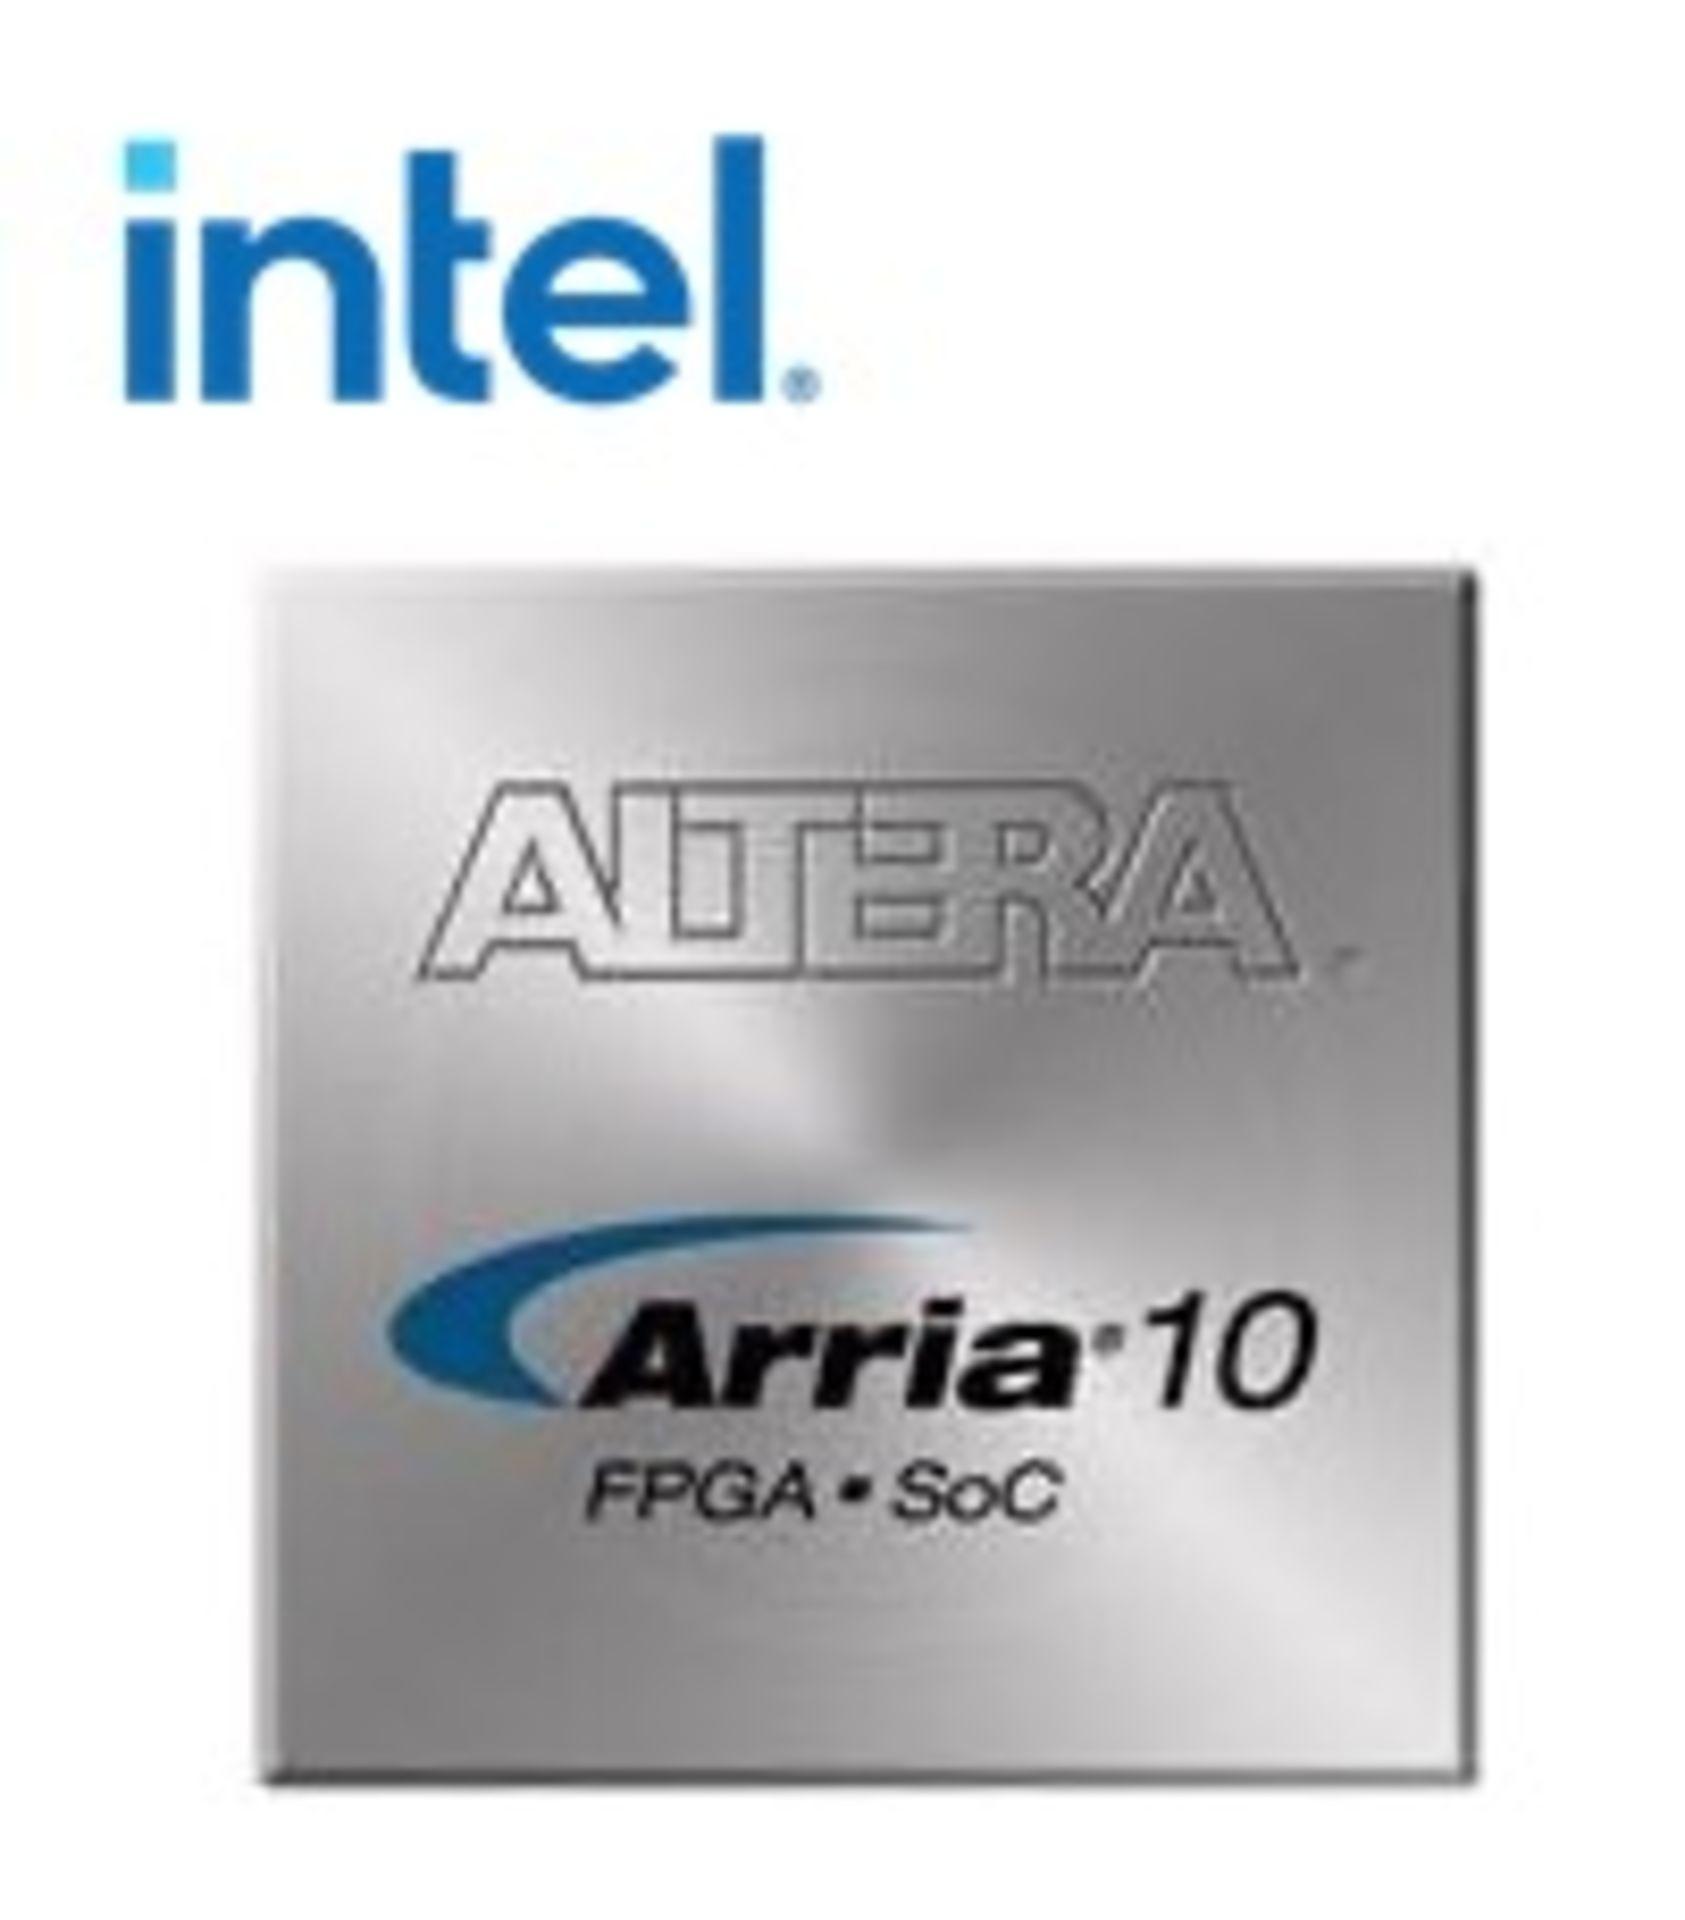 Intel 10AX066H3F34E2SG, QTY 72, FPGA Arria 10 GX Family 660000 Cells 20nm Technology 0.9V